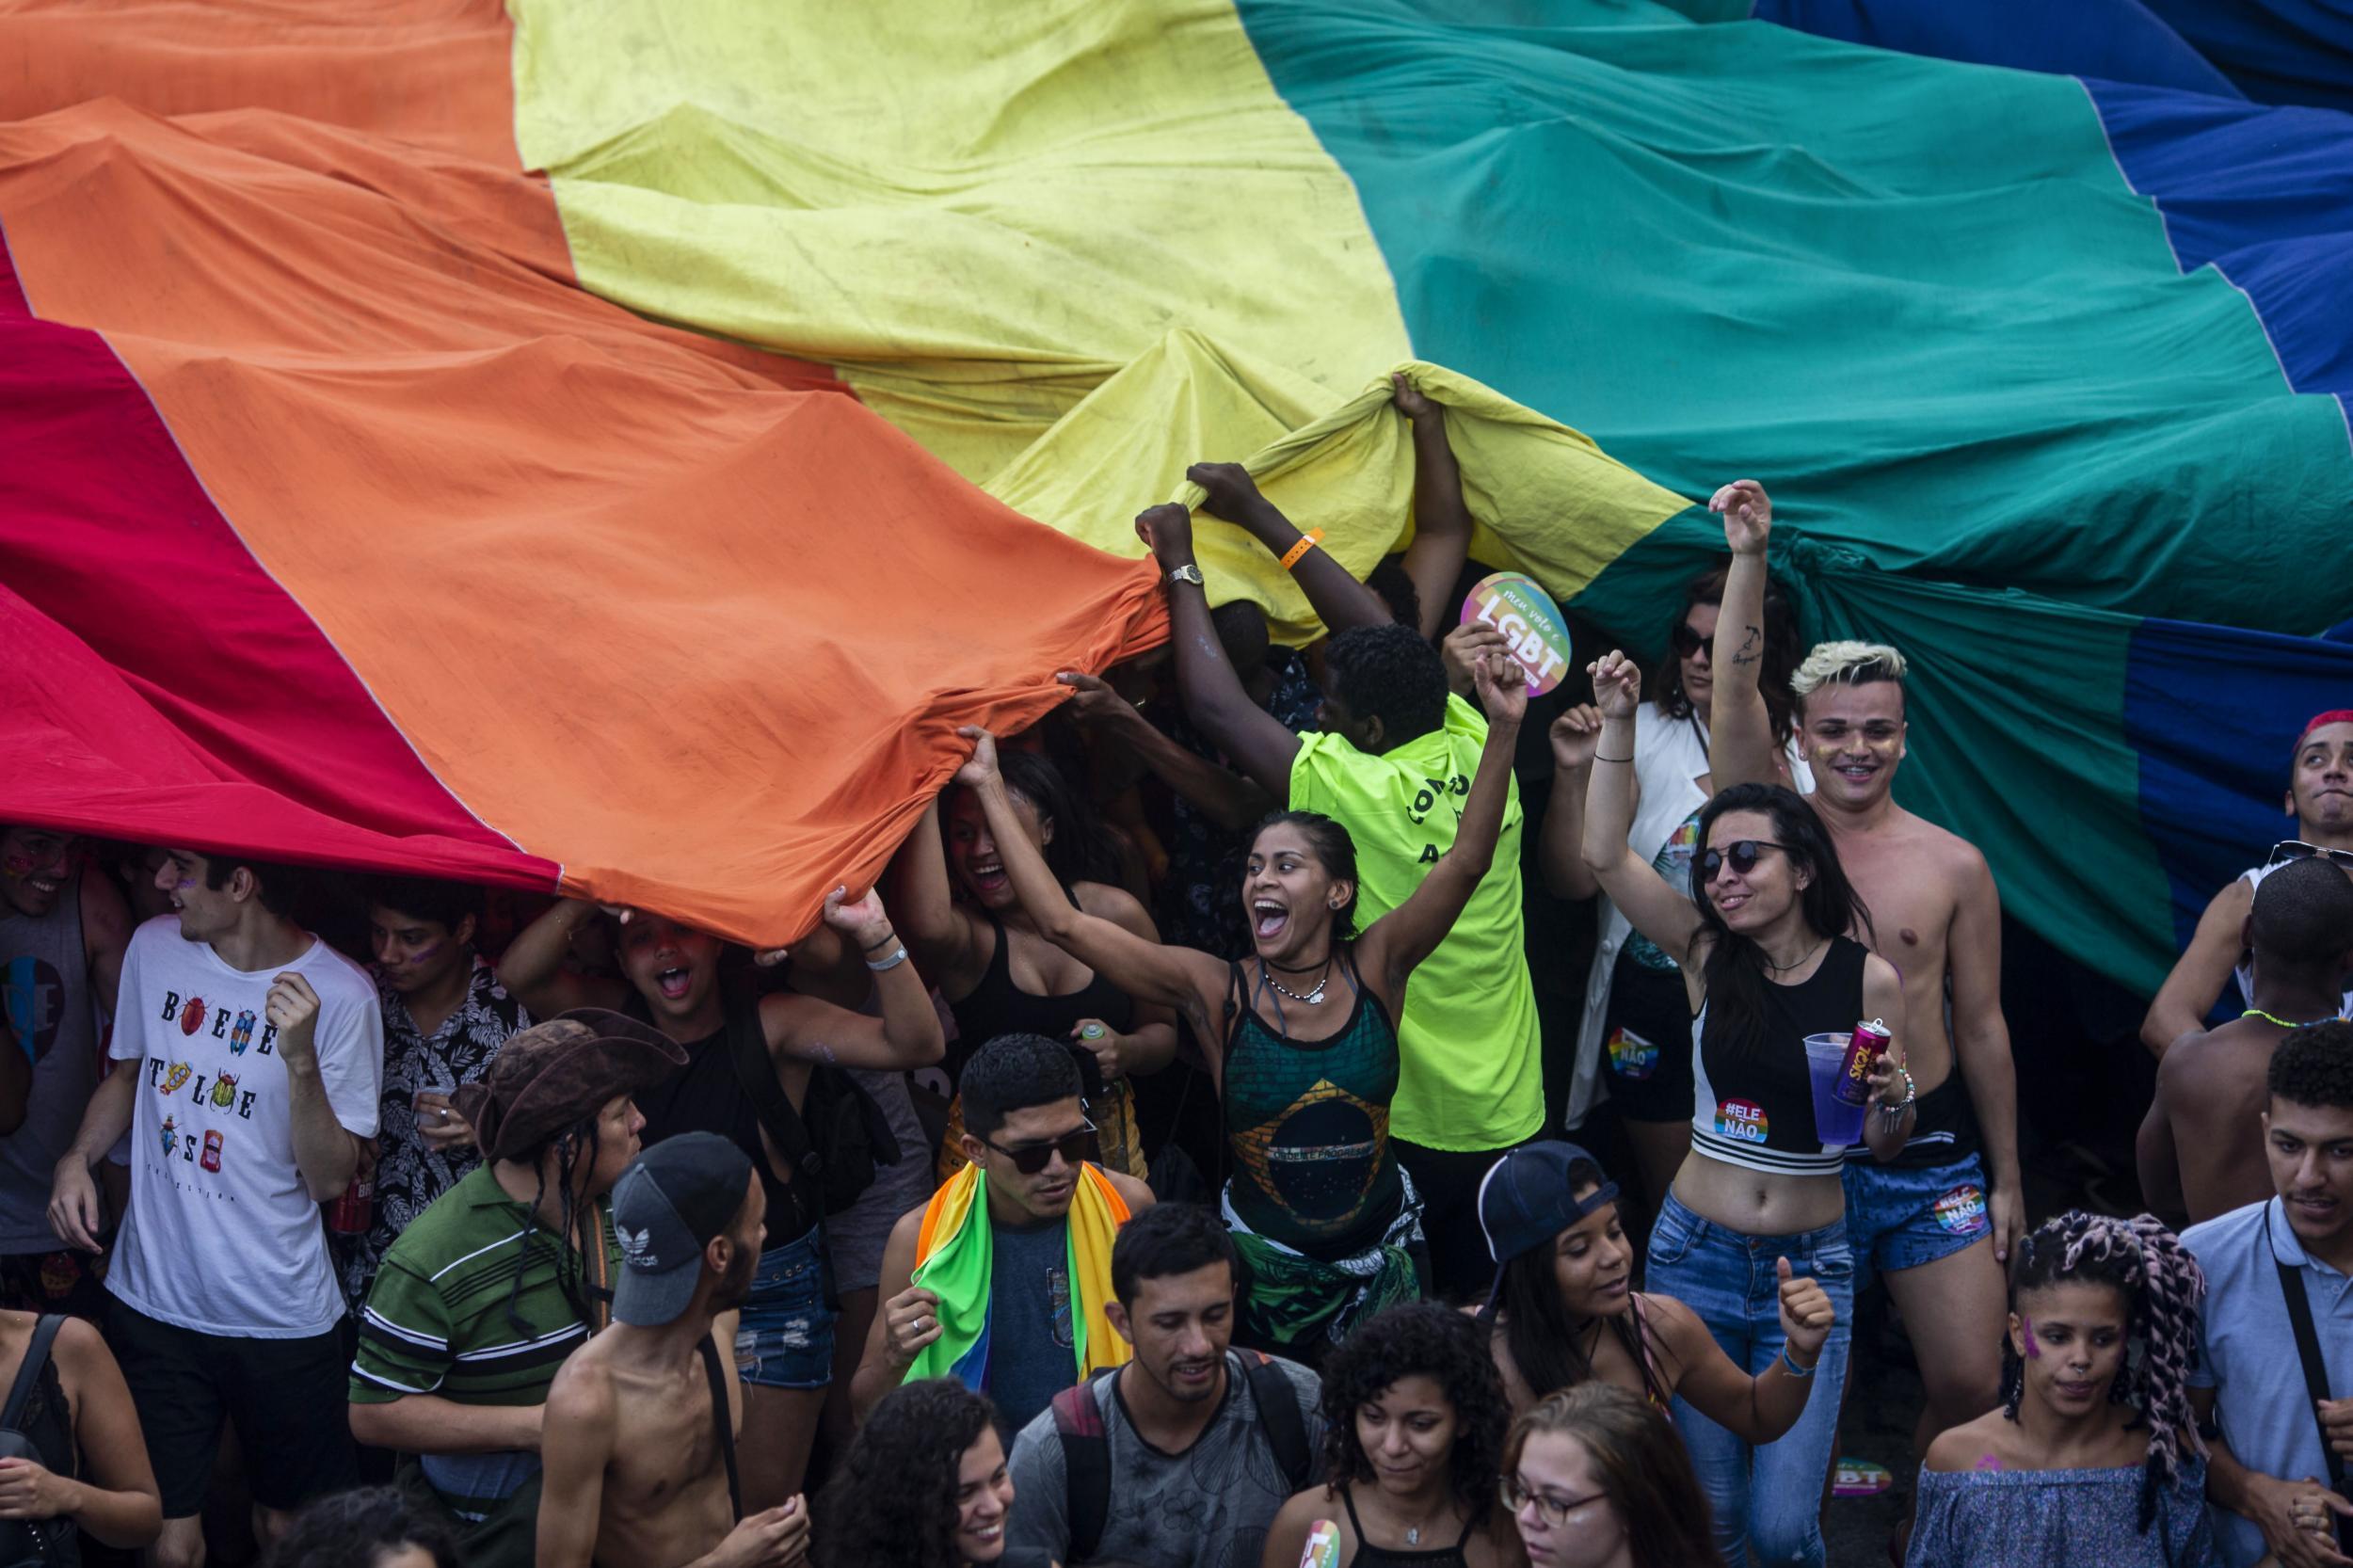 La Corte Suprema de Brasil criminaliza la homofobia y la transfobia